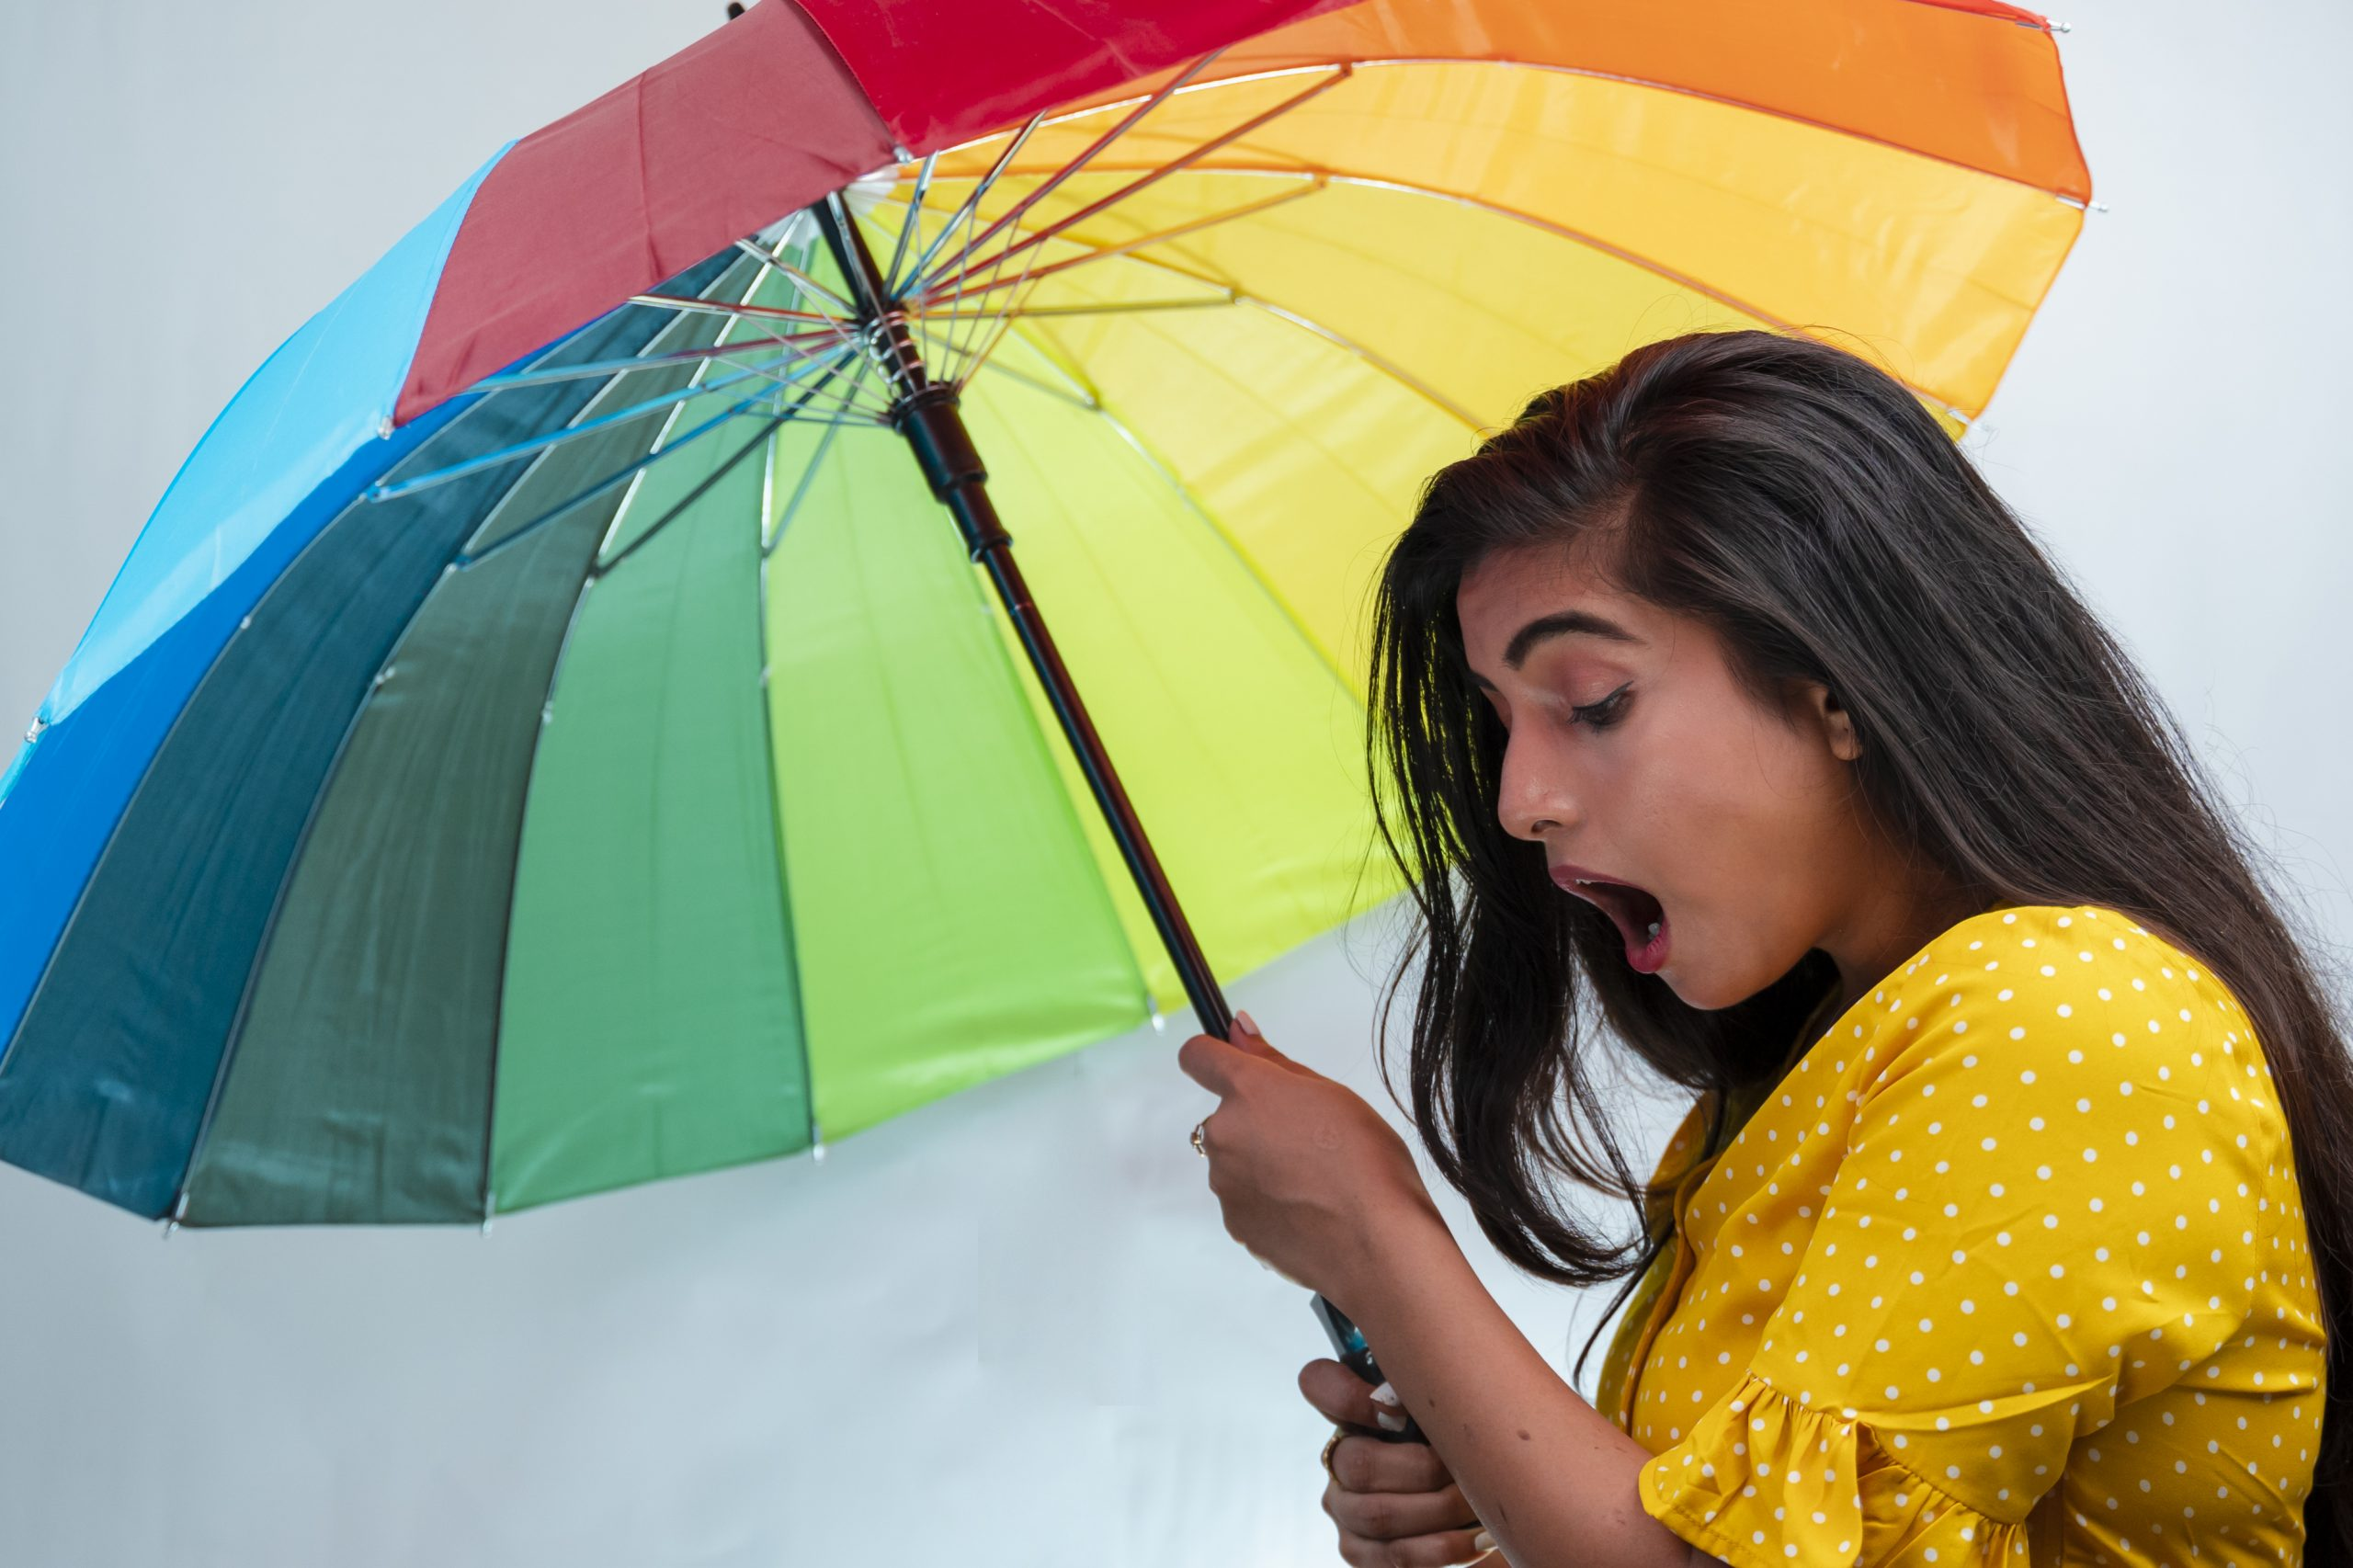 Shocked girl with umbrella